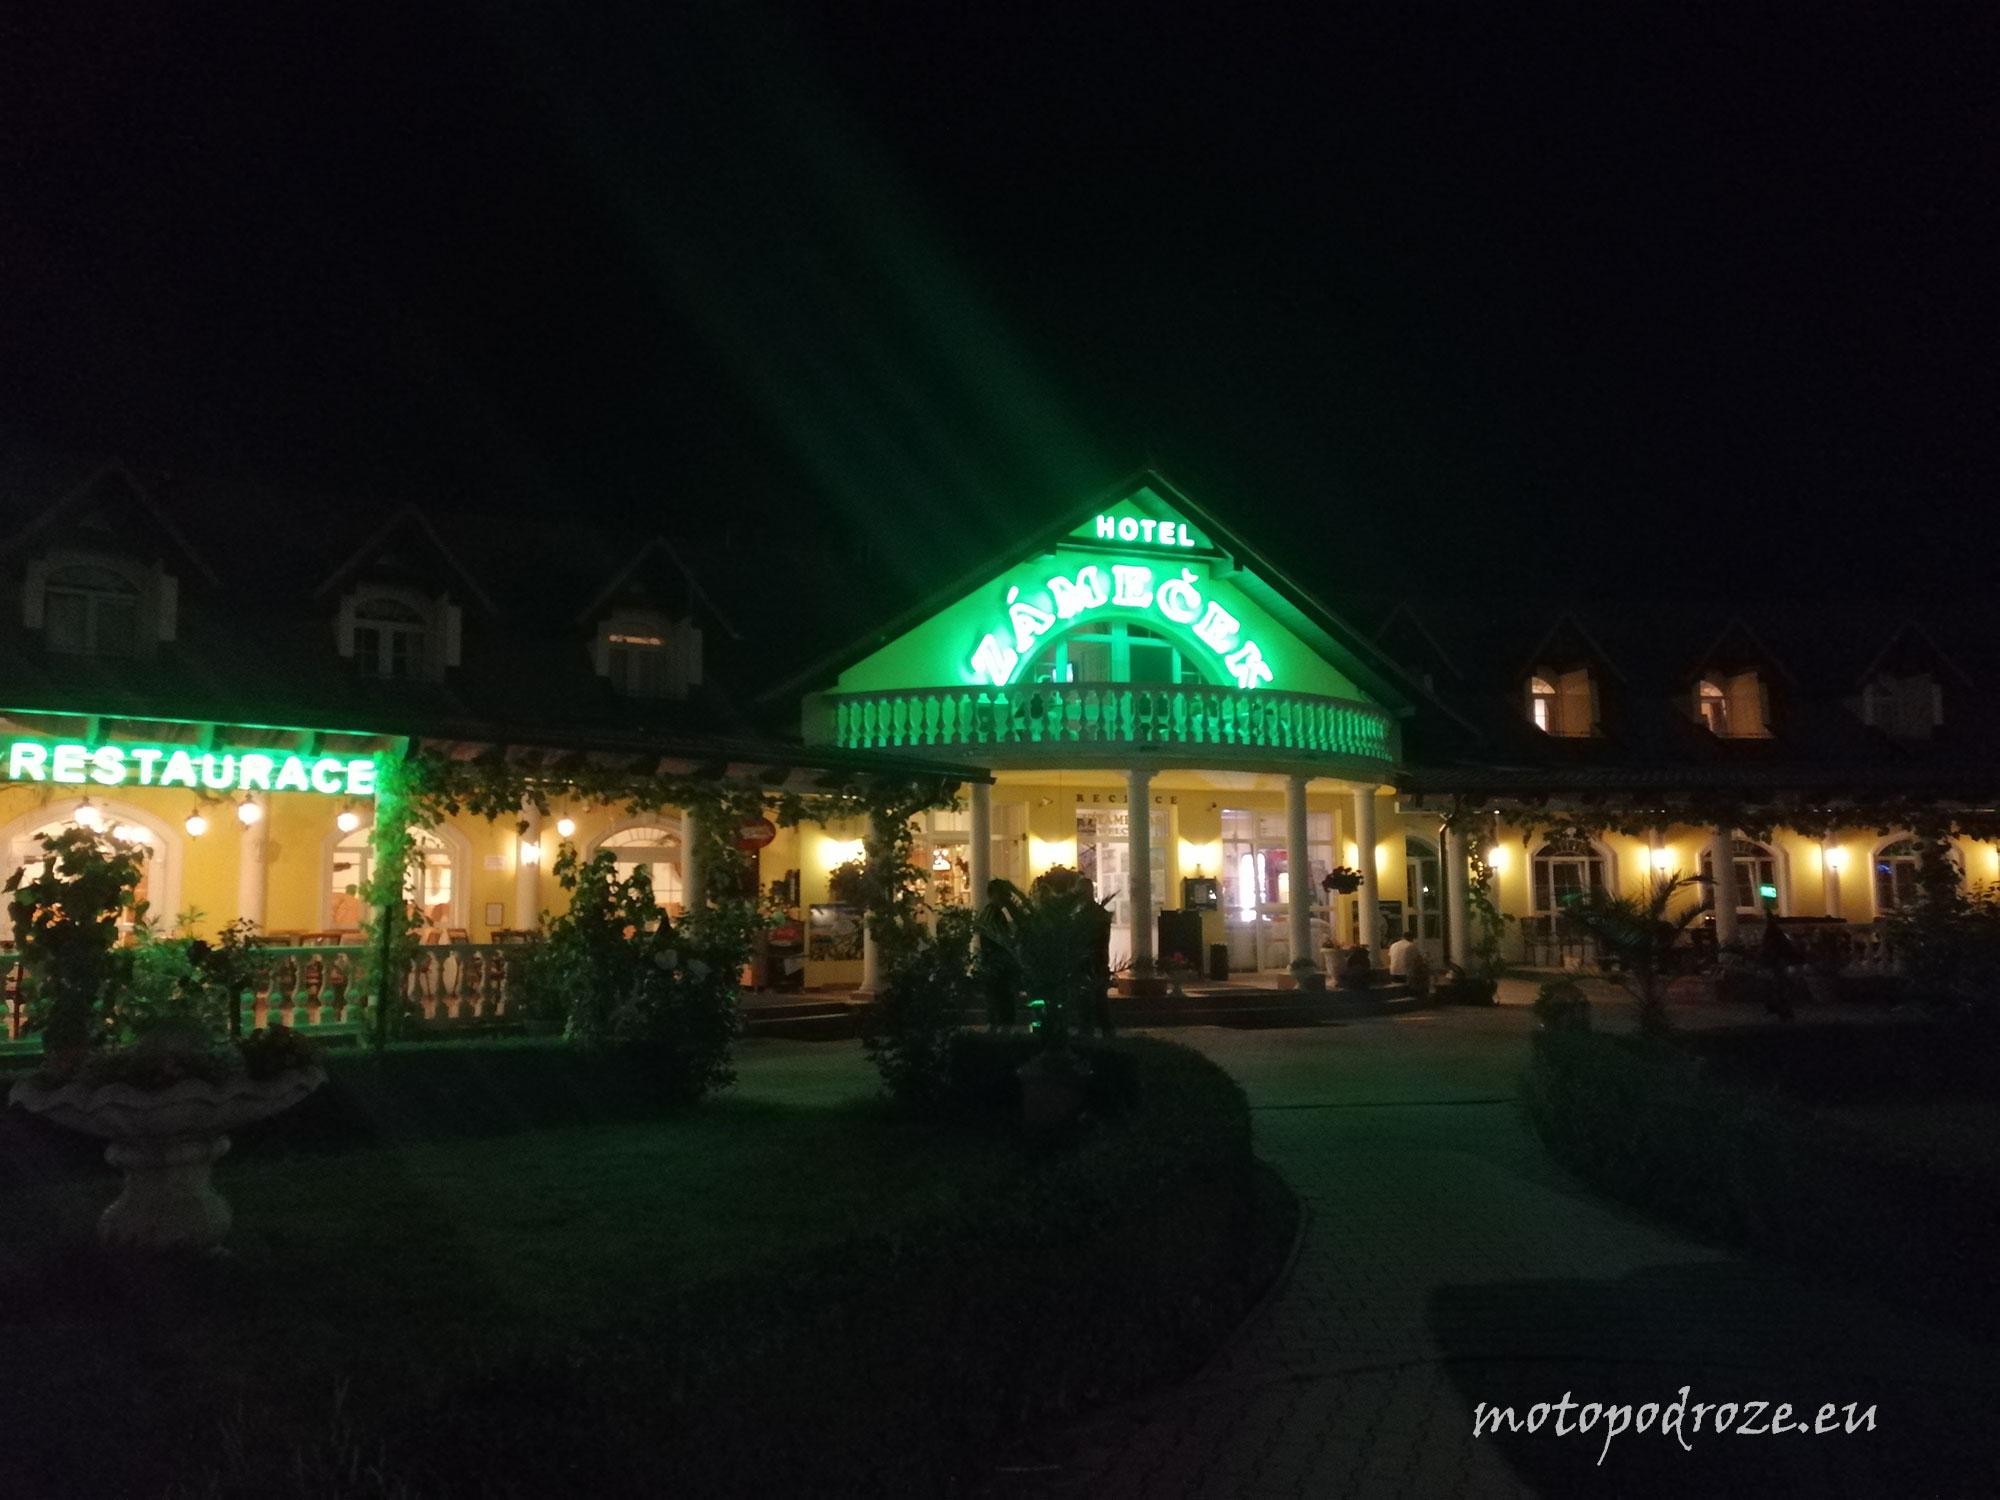 Hotel Zamecek, Mikulov